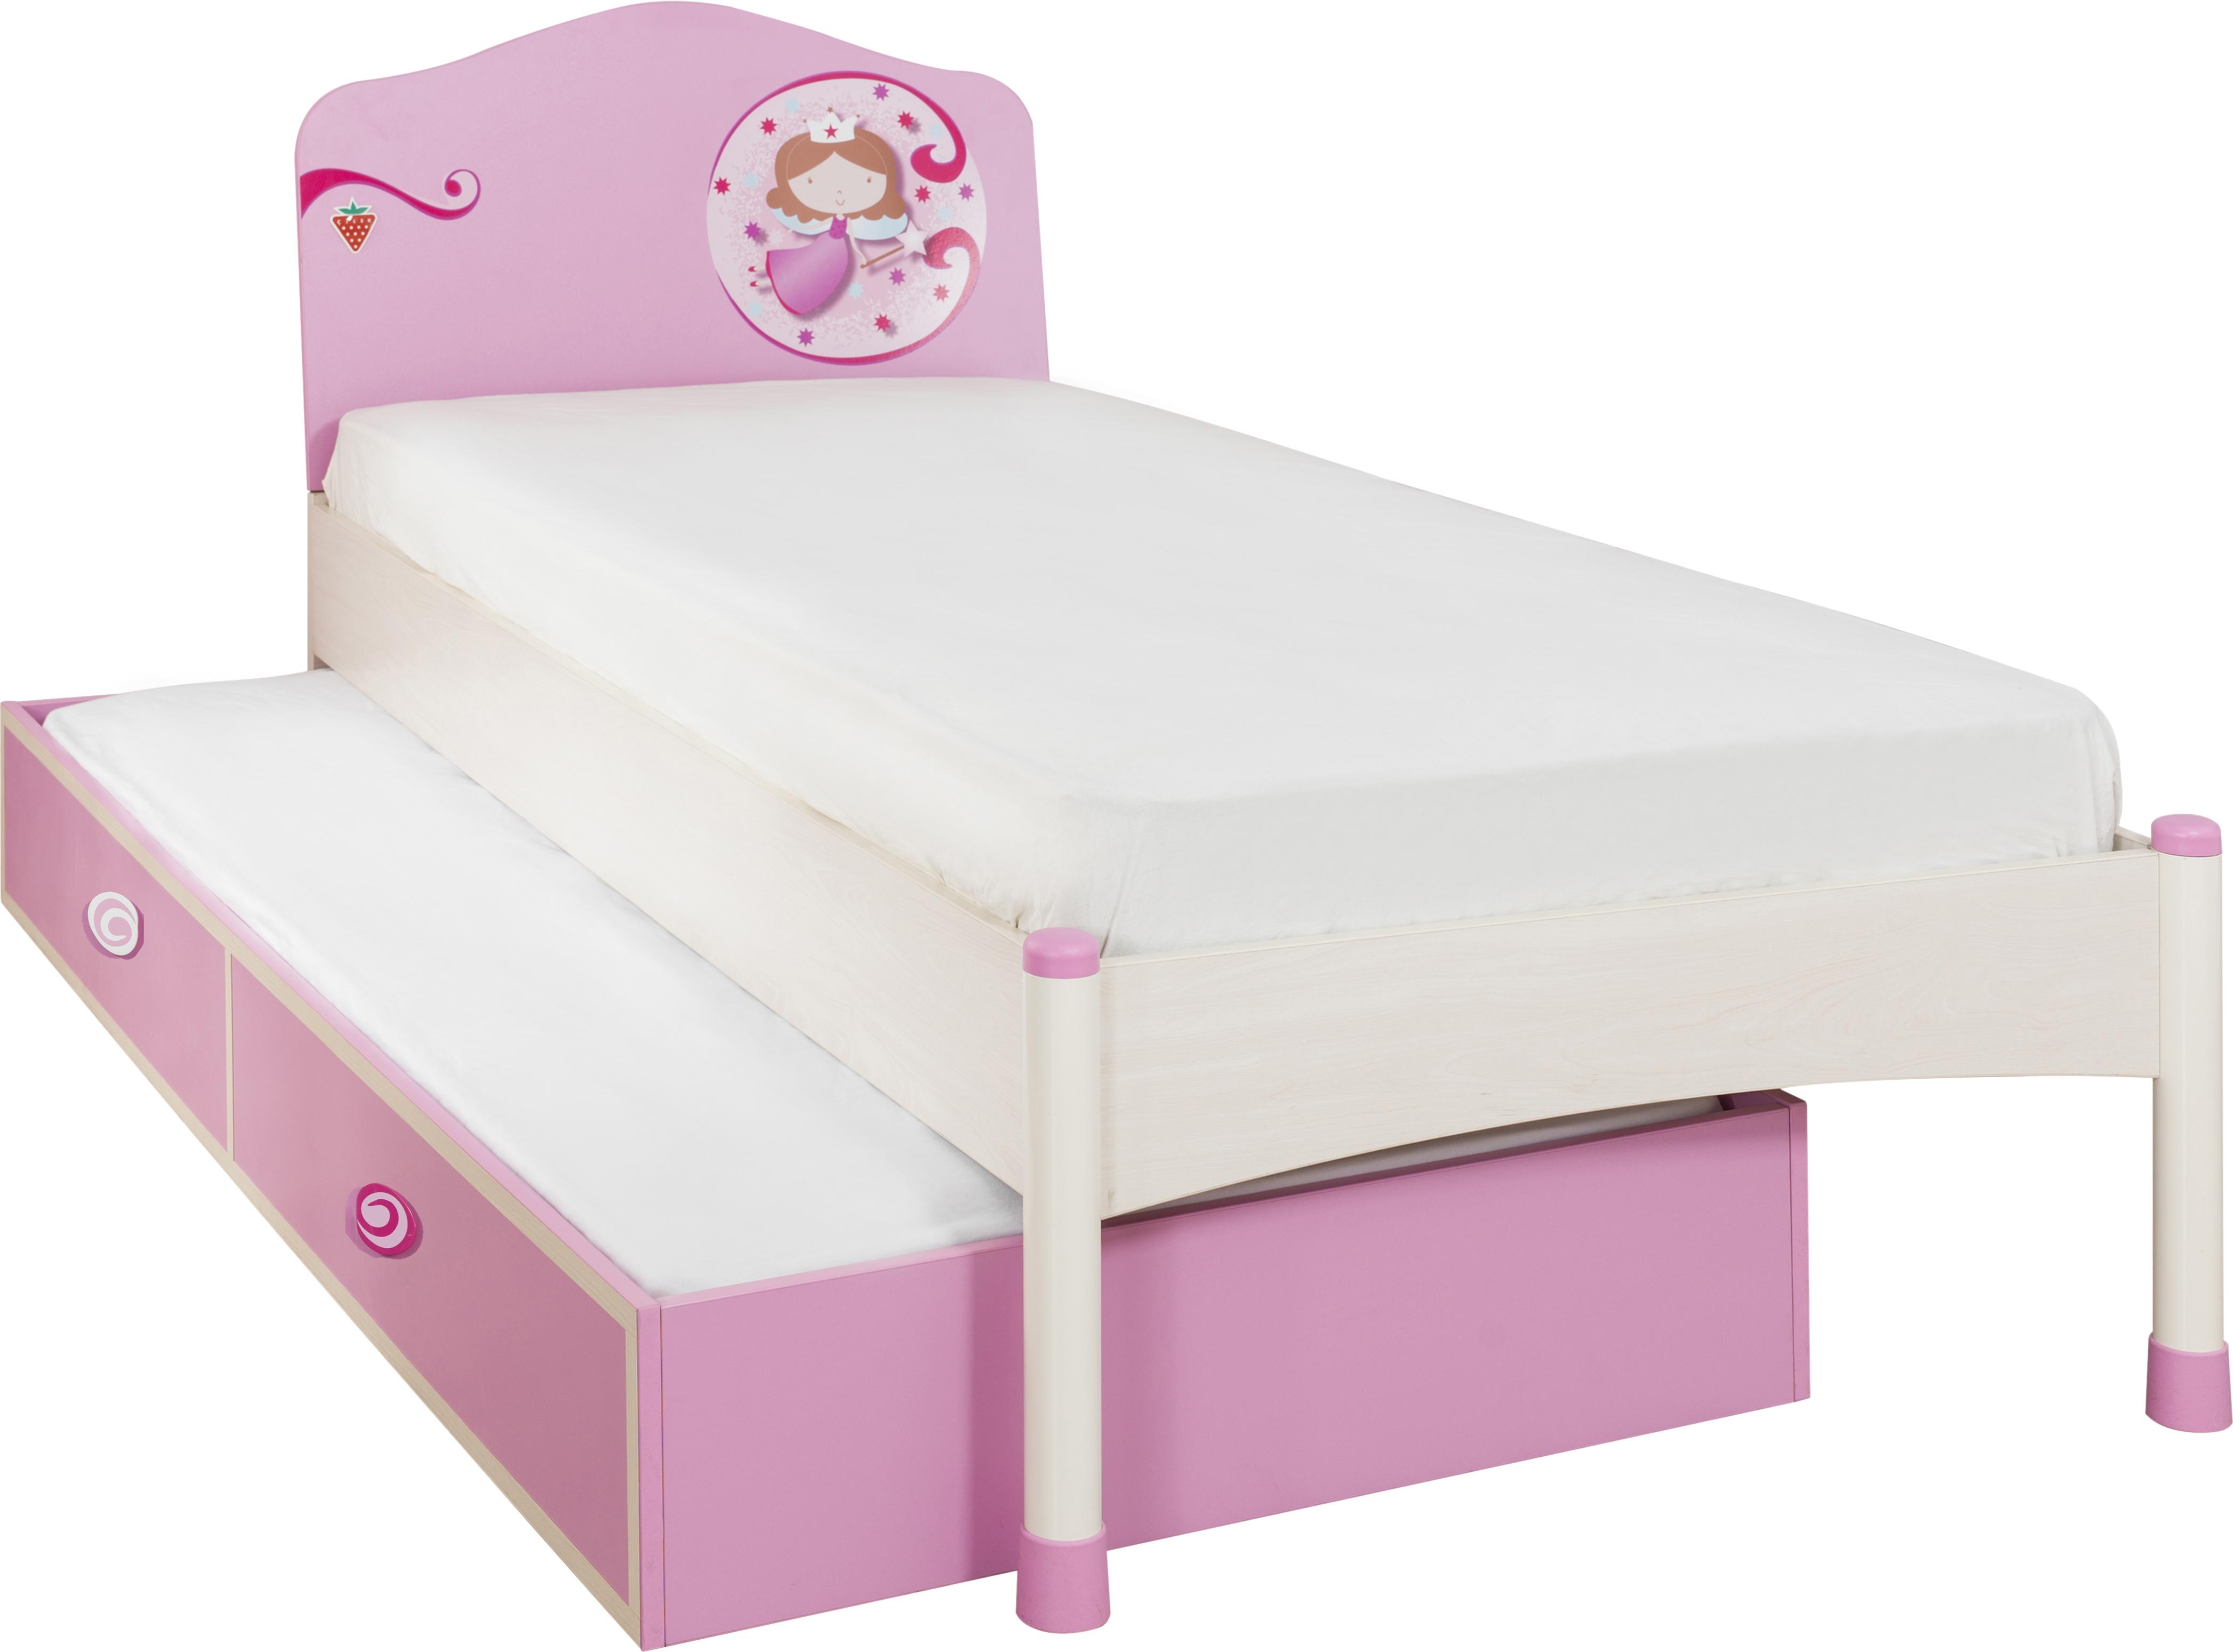 Pat din pal cu sertar, pentru copii Little Princess Pink / Nature, 200 x 90 cm poza